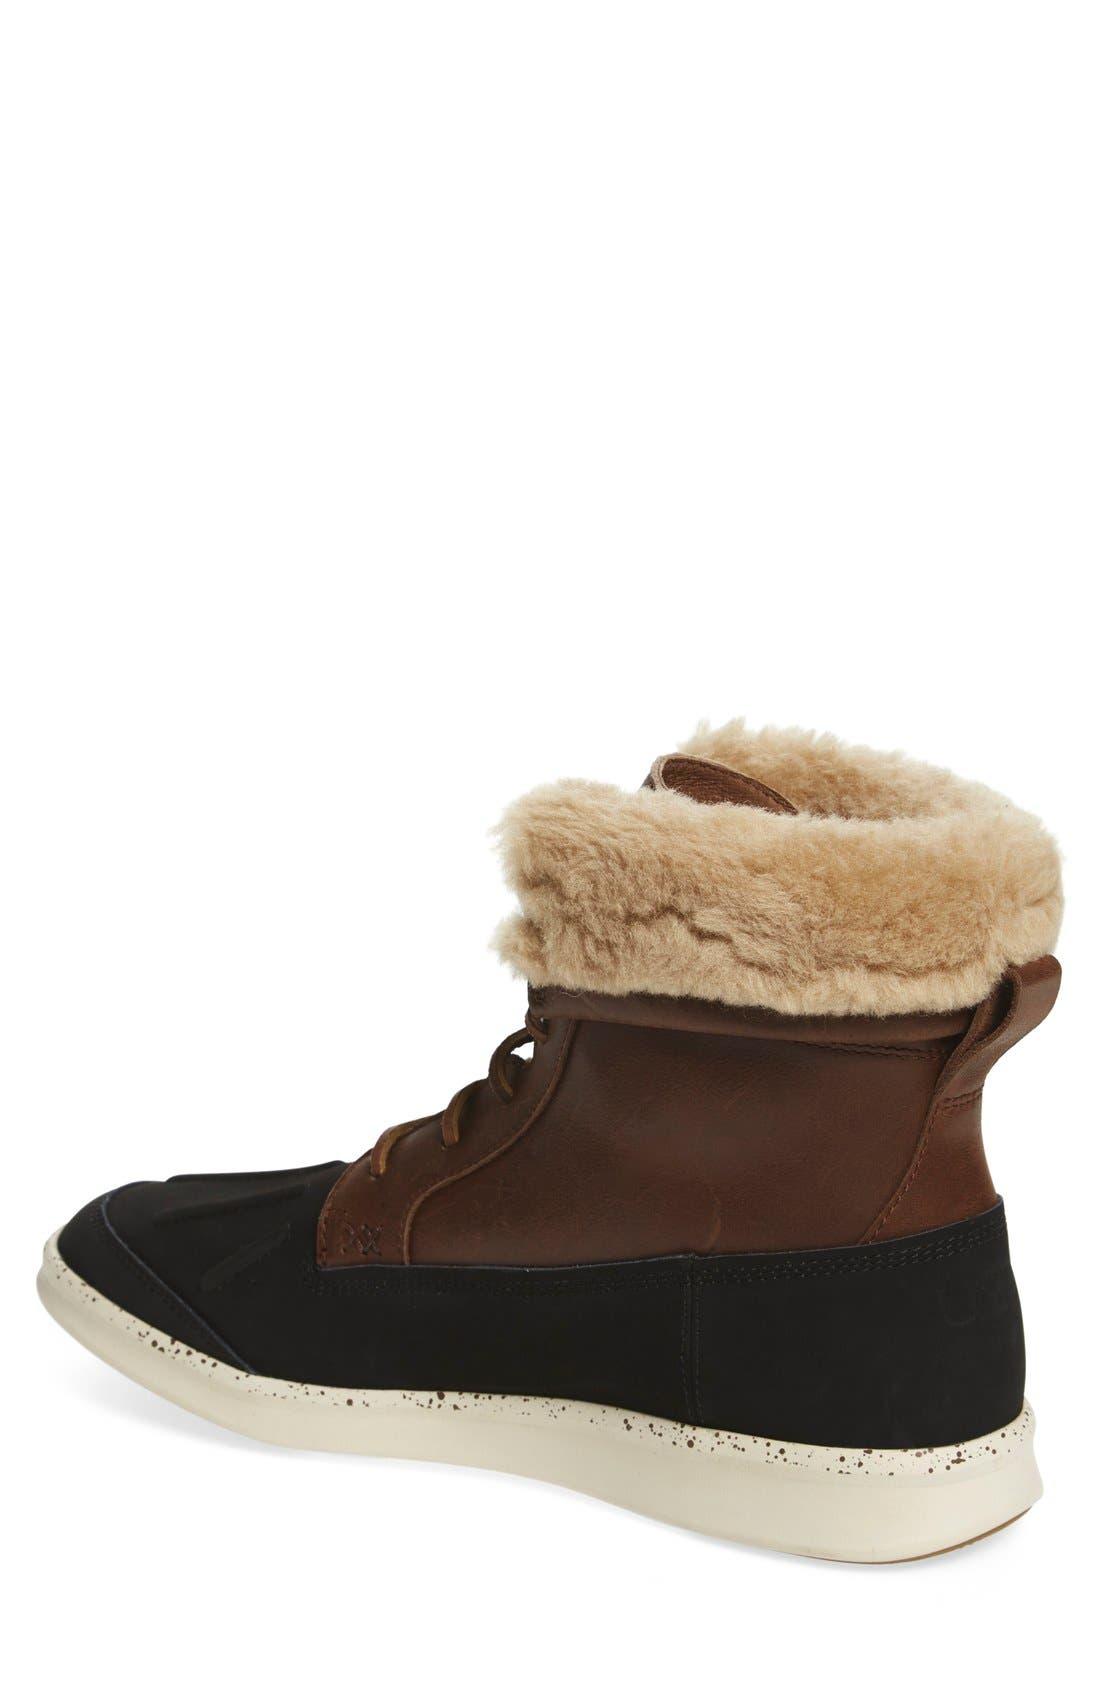 Alternate Image 2  - UGG® Roskoe Snow Boot (Men)